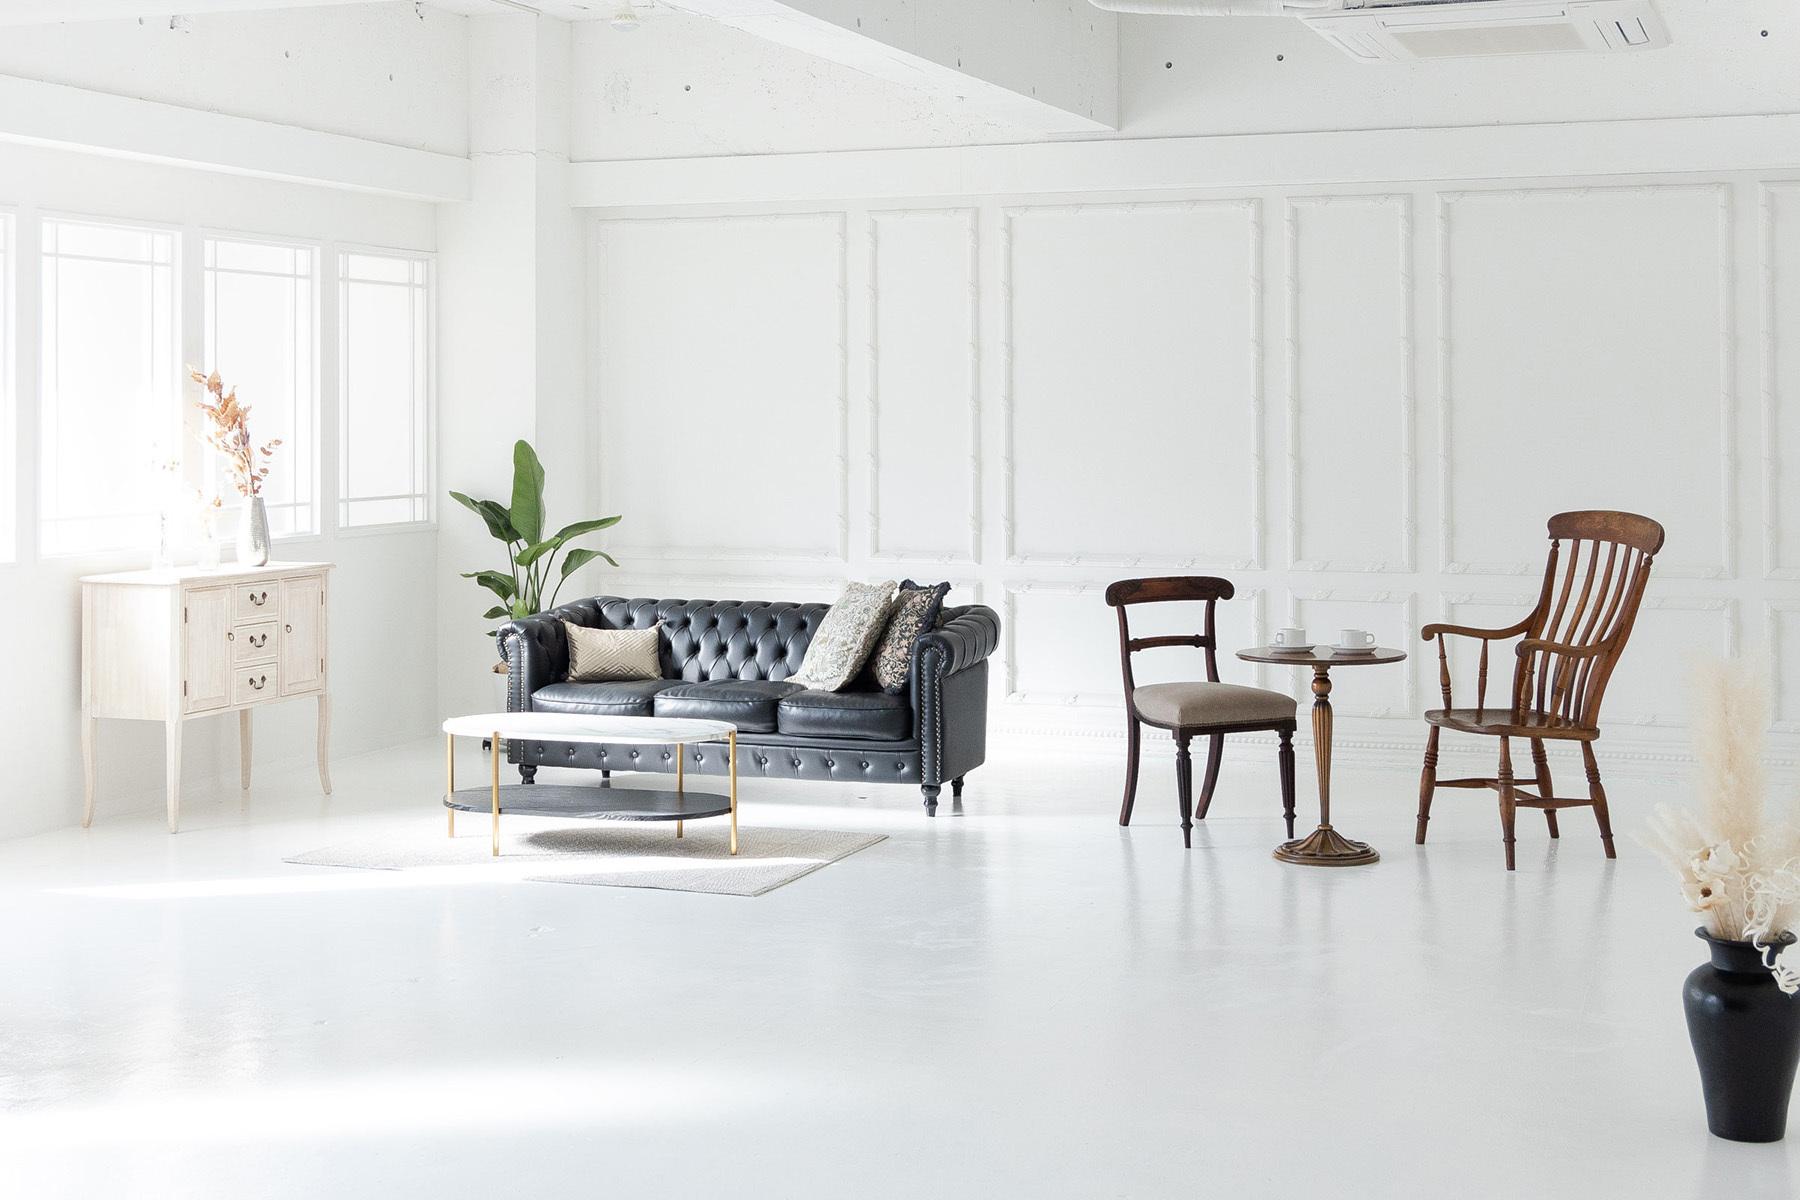 STUDIO FOXTAIL Ast (スタジオ フォックステイル Ast)白が基調の光あふれるスペース